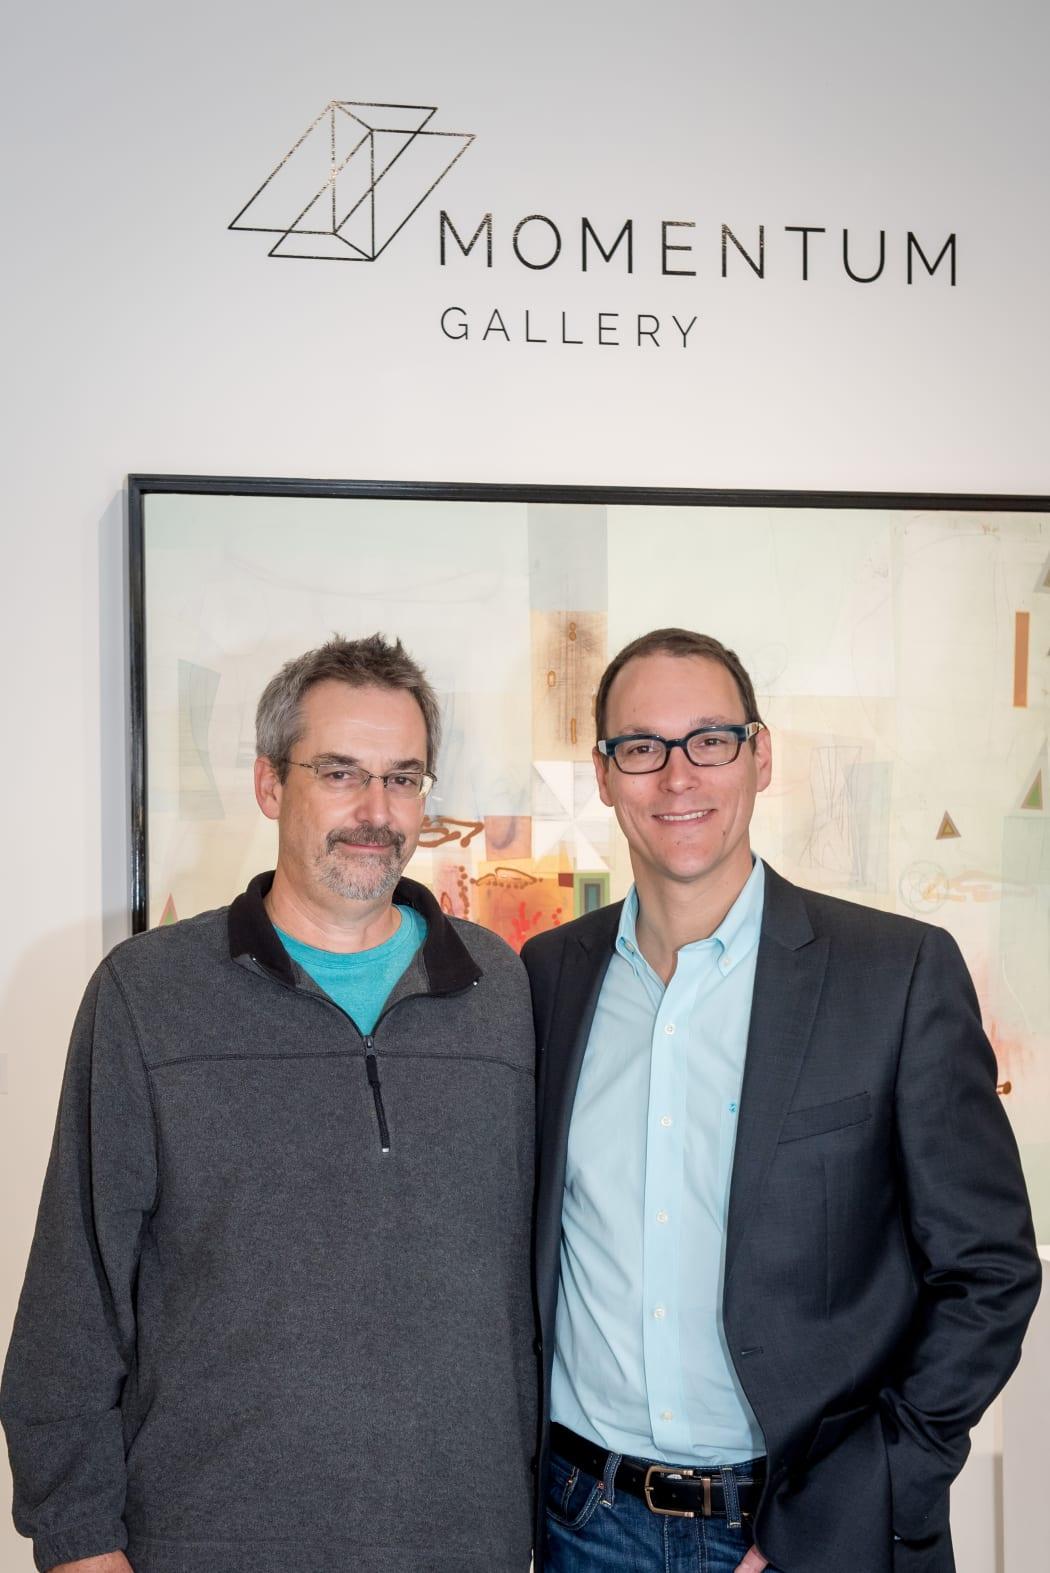 Painter Michael Barringer with Momentum Gallery Director Jordan Ahlers